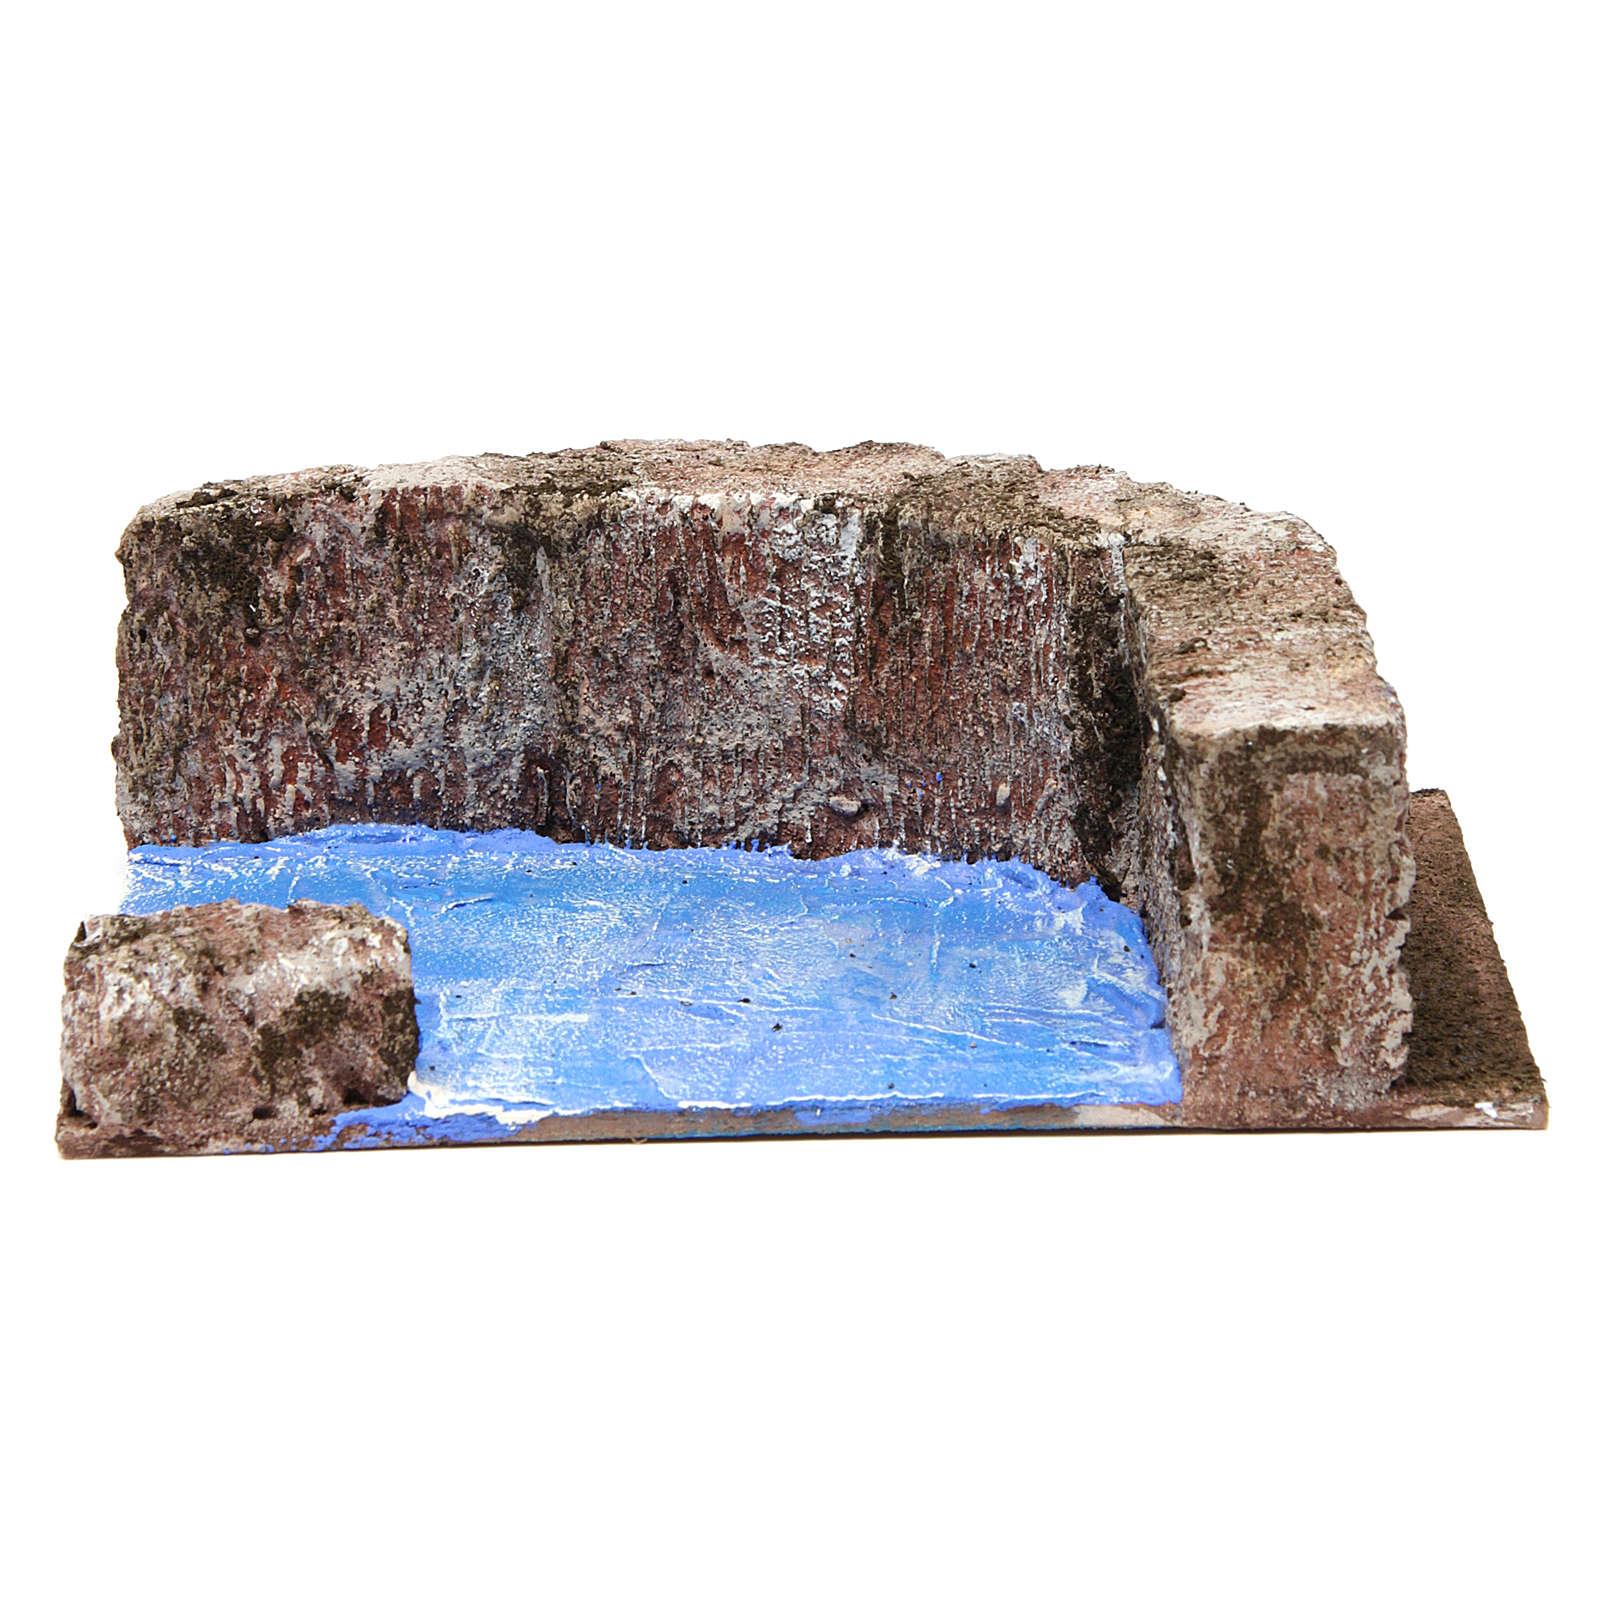 Right Angle Stream for 10 cm Nativity 15X20X10 cm 4